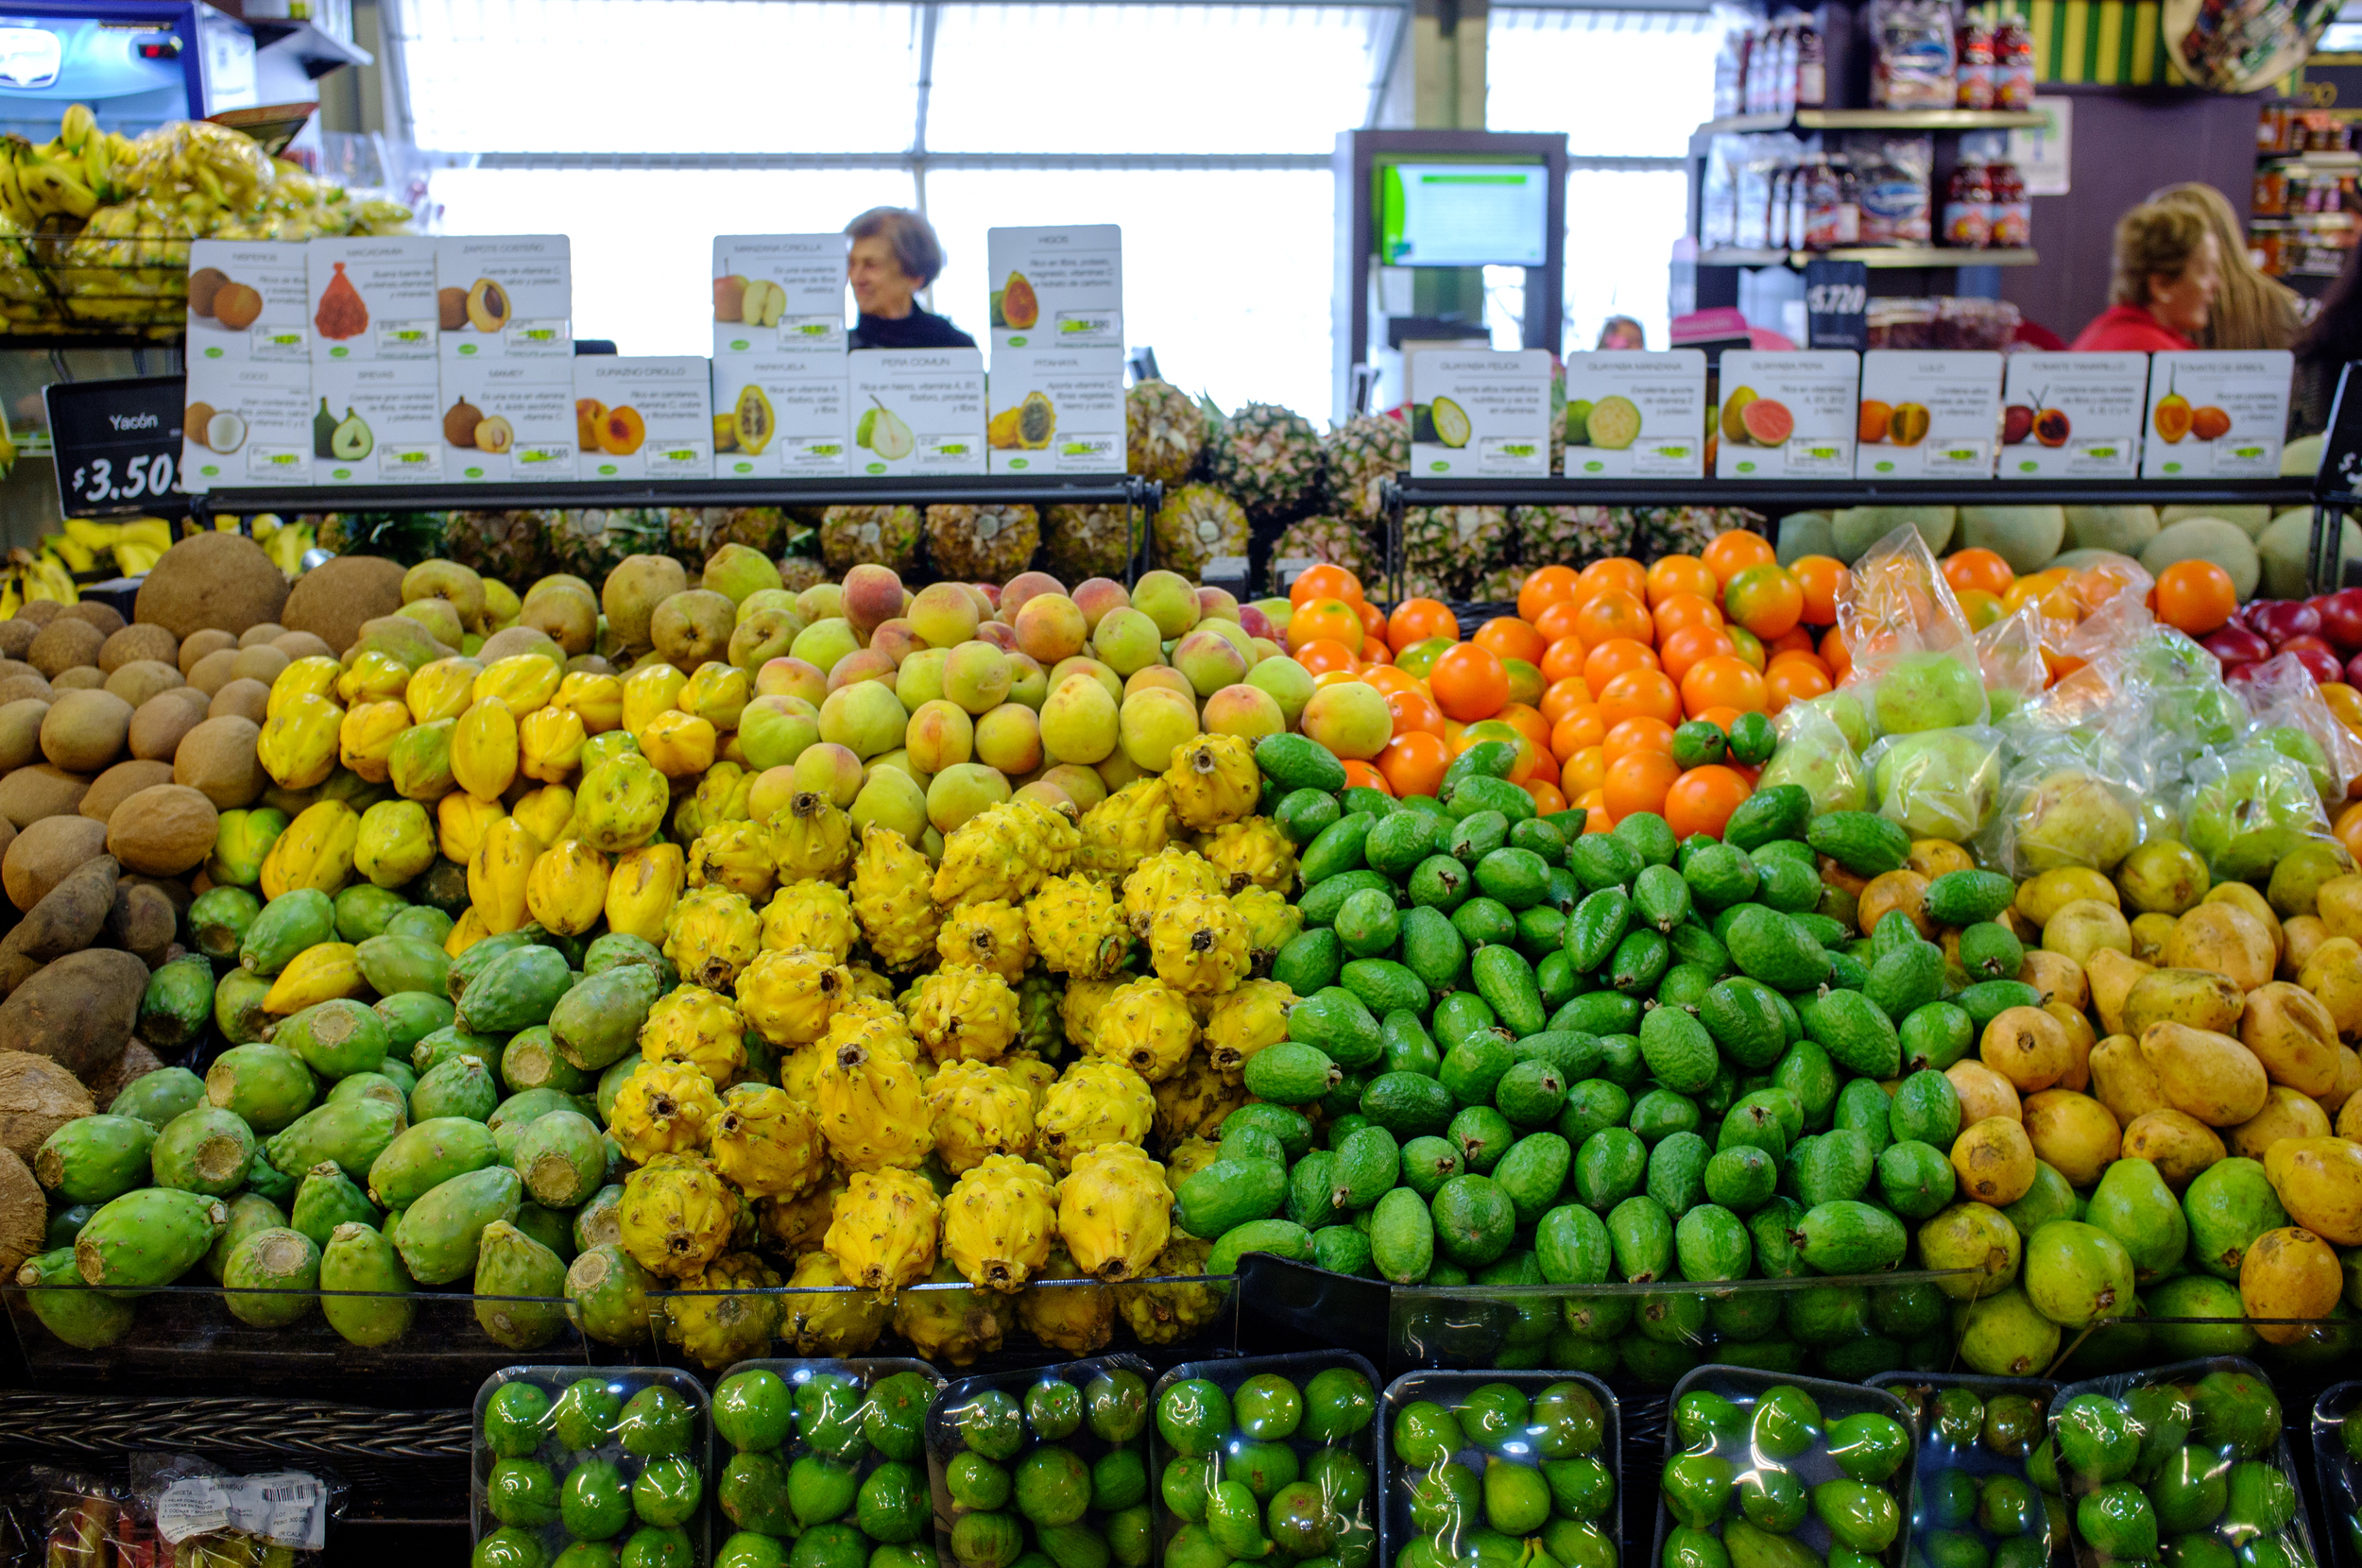 Fruits at the local Carulla supermarket, Chapinero, Bogotá